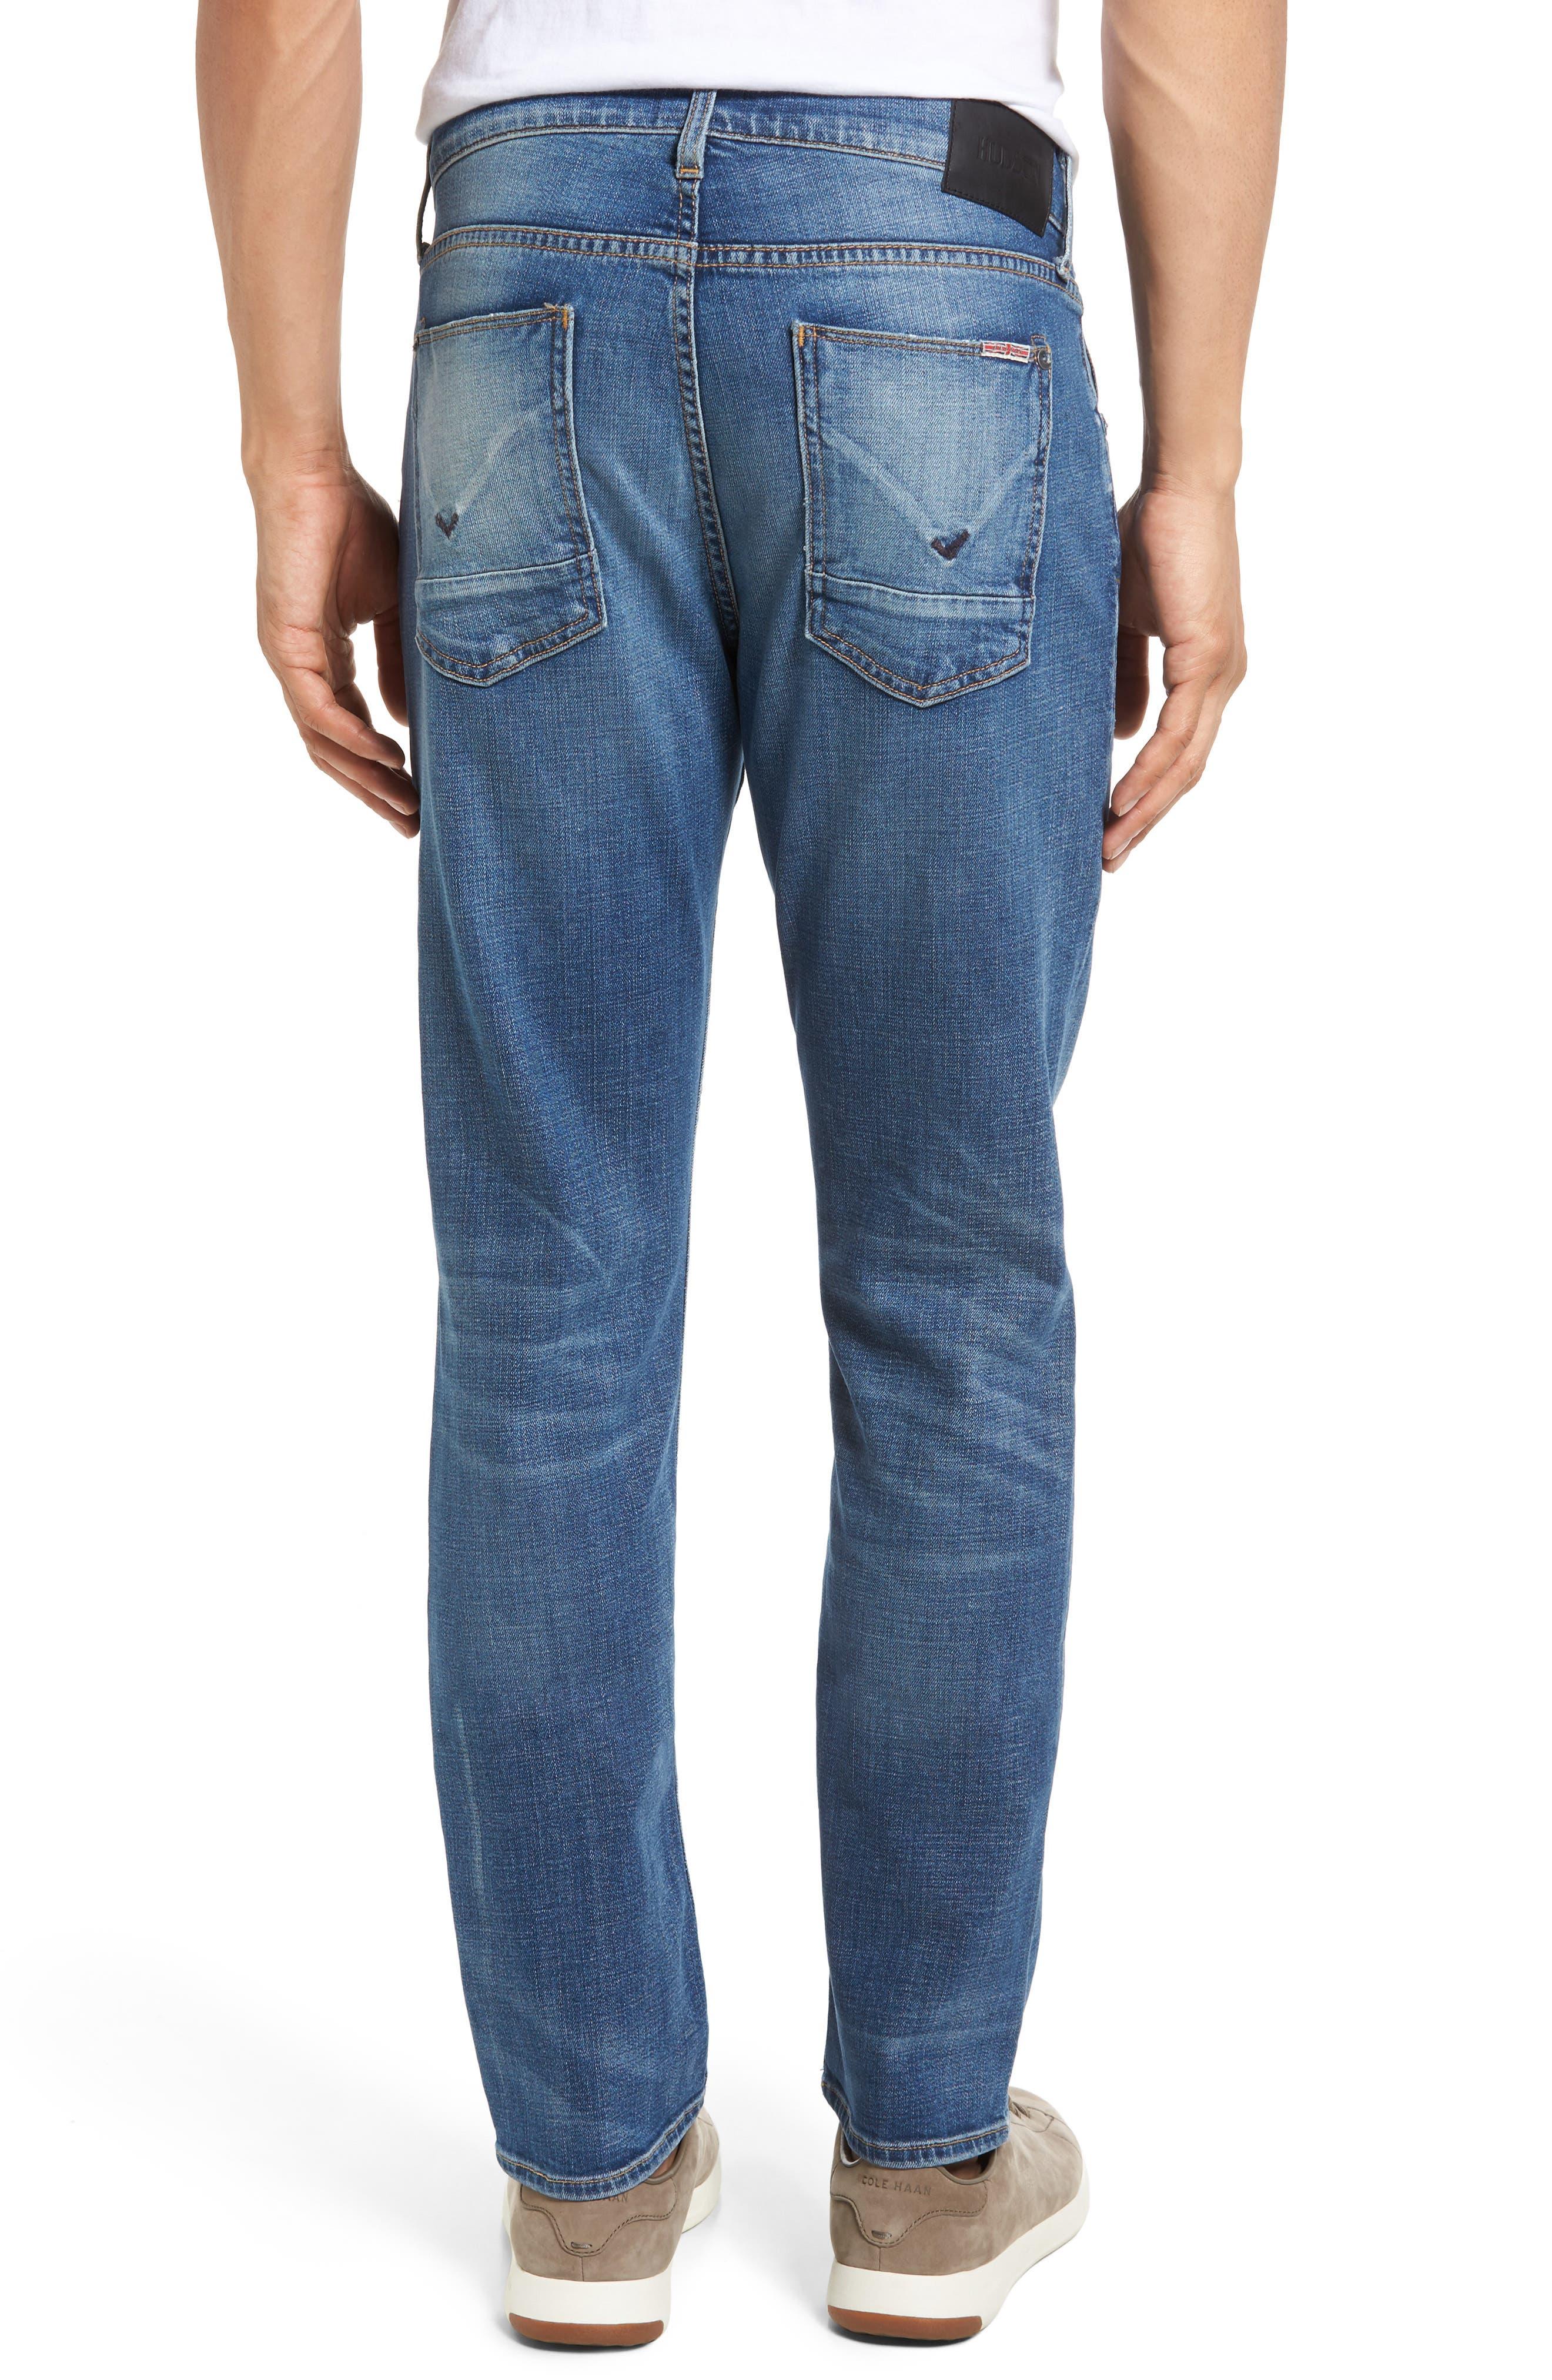 Blake Slim Fit Jeans,                             Alternate thumbnail 2, color,                             453